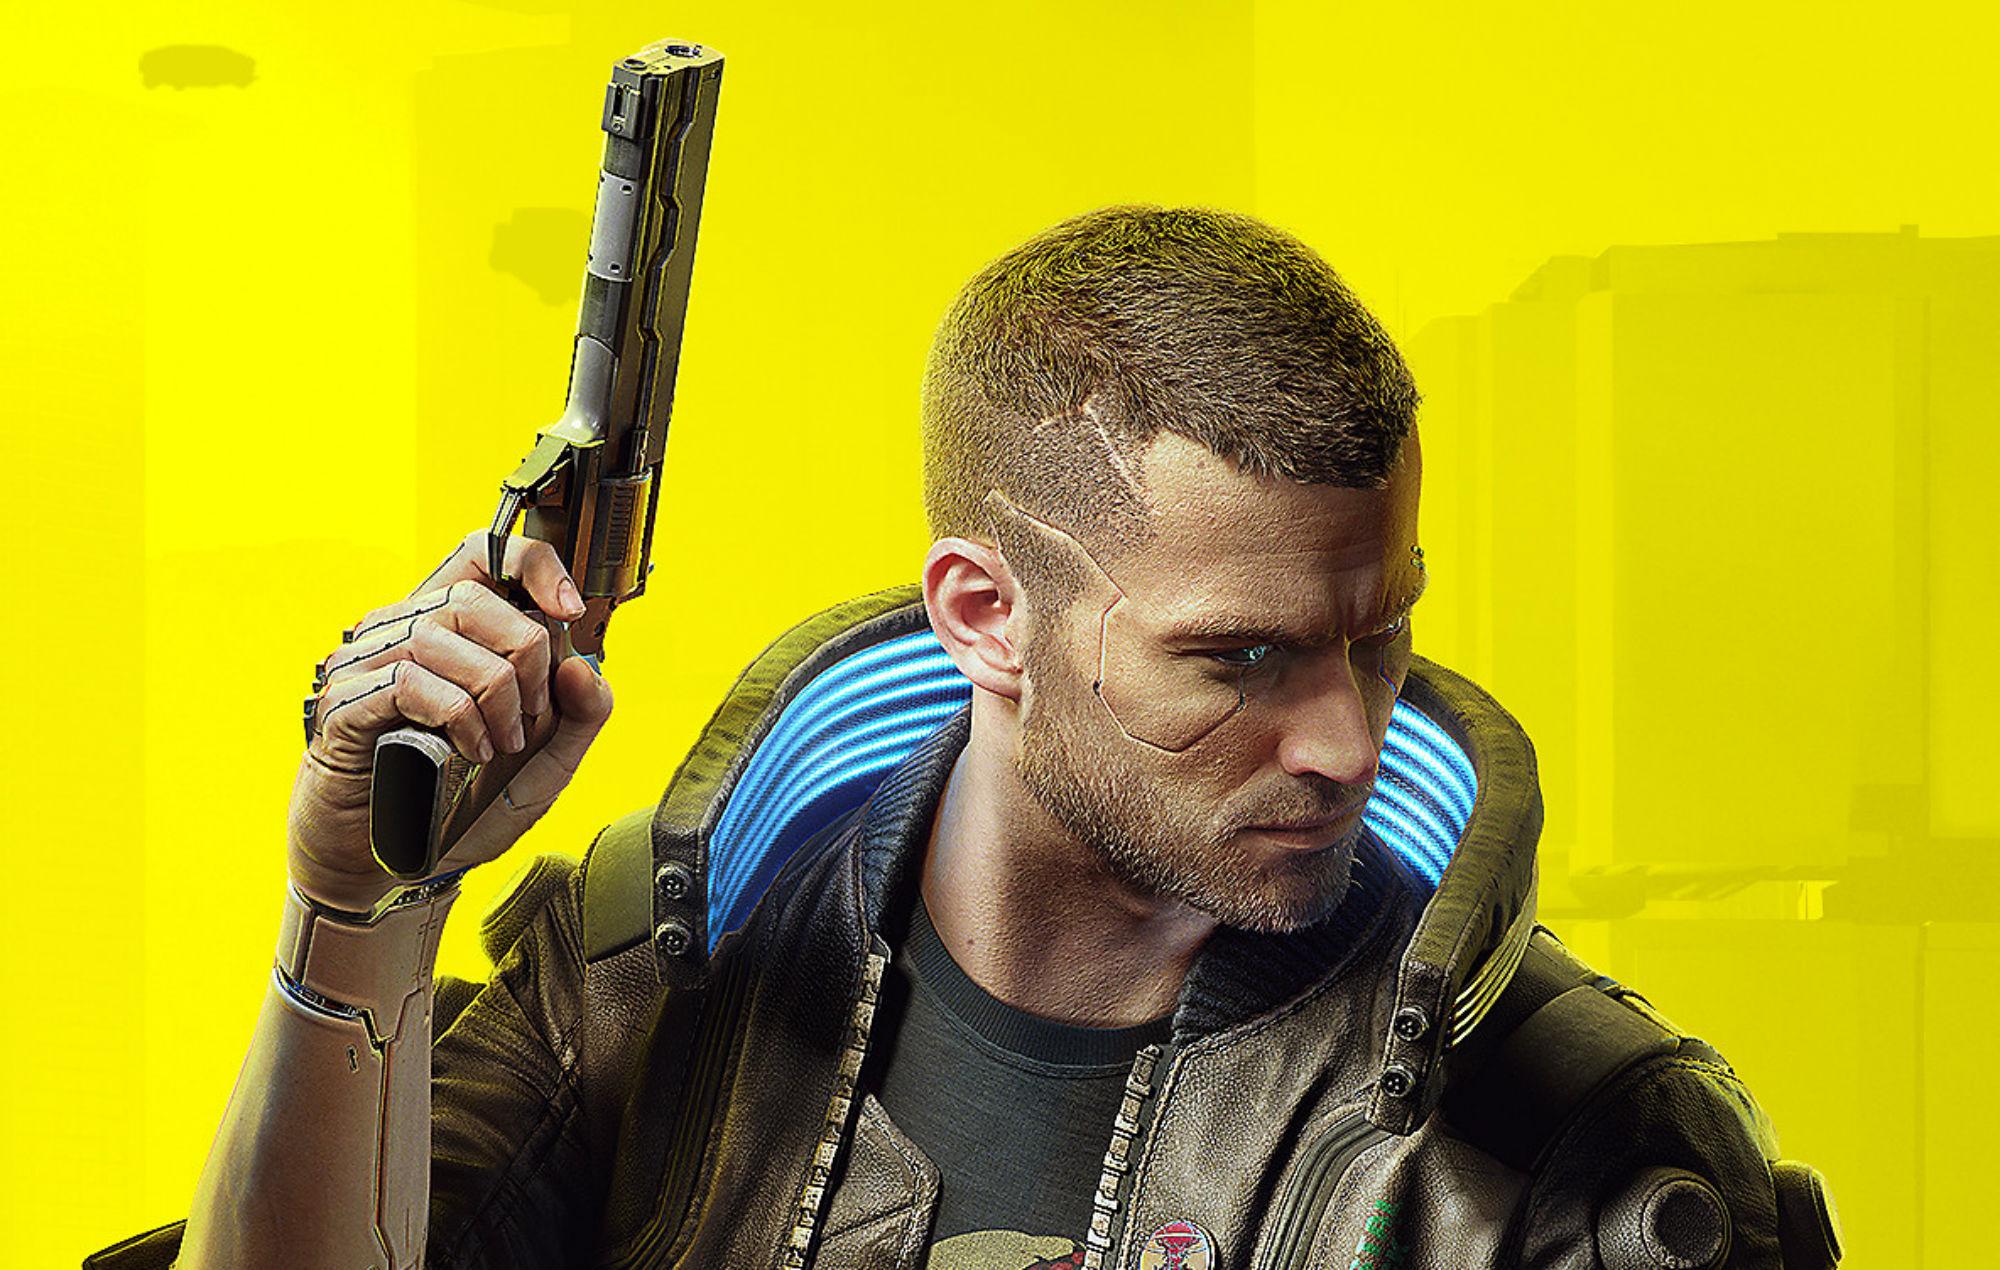 'Cyberpunk 2077' sells 13million copies despite refunds